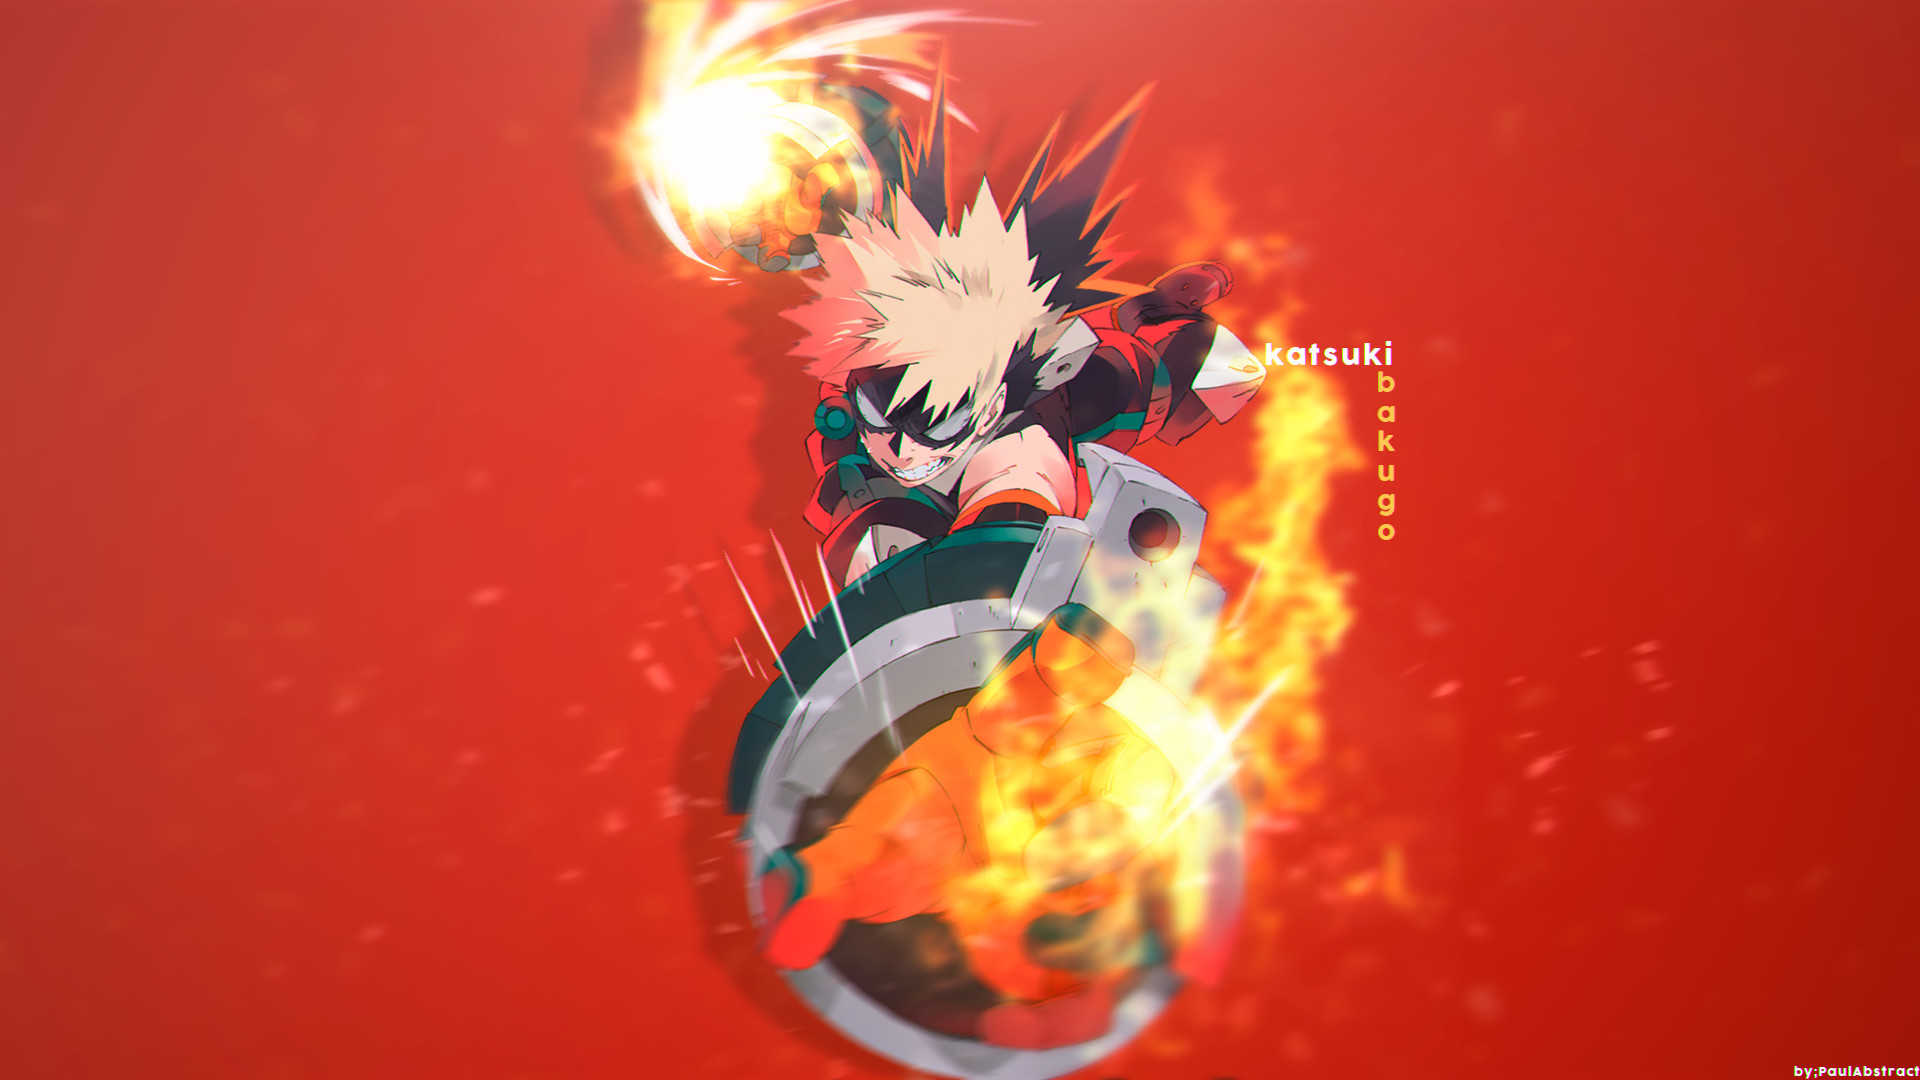 Anime Wallpaper Hd Cute Aesthetic Anime Wallpapers